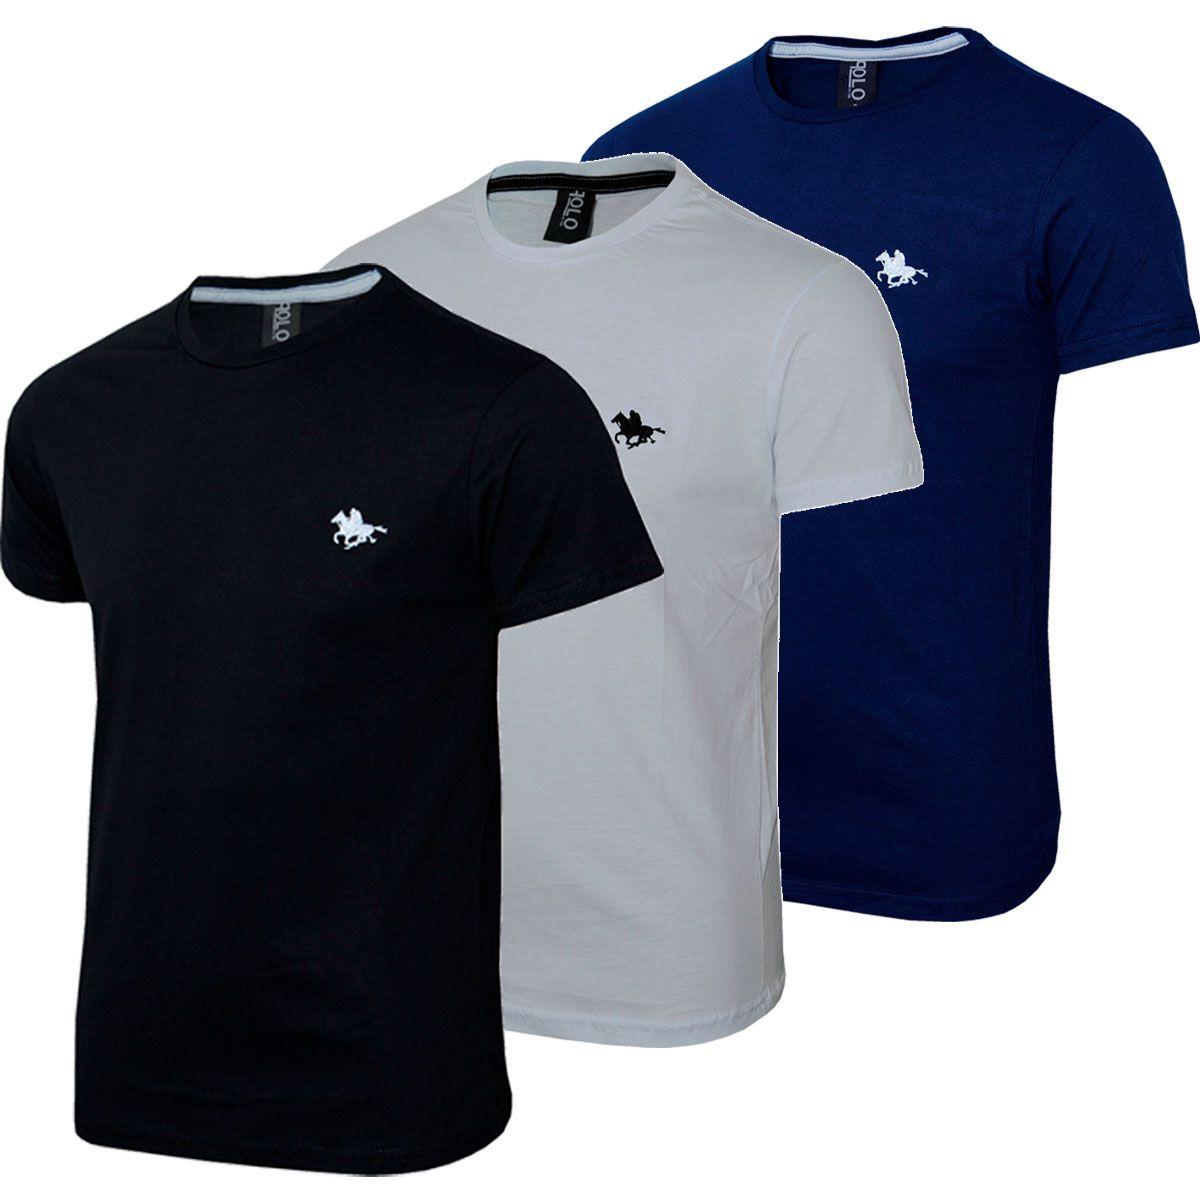 Kit C/3 Un Camisetas Blusas Masculinas